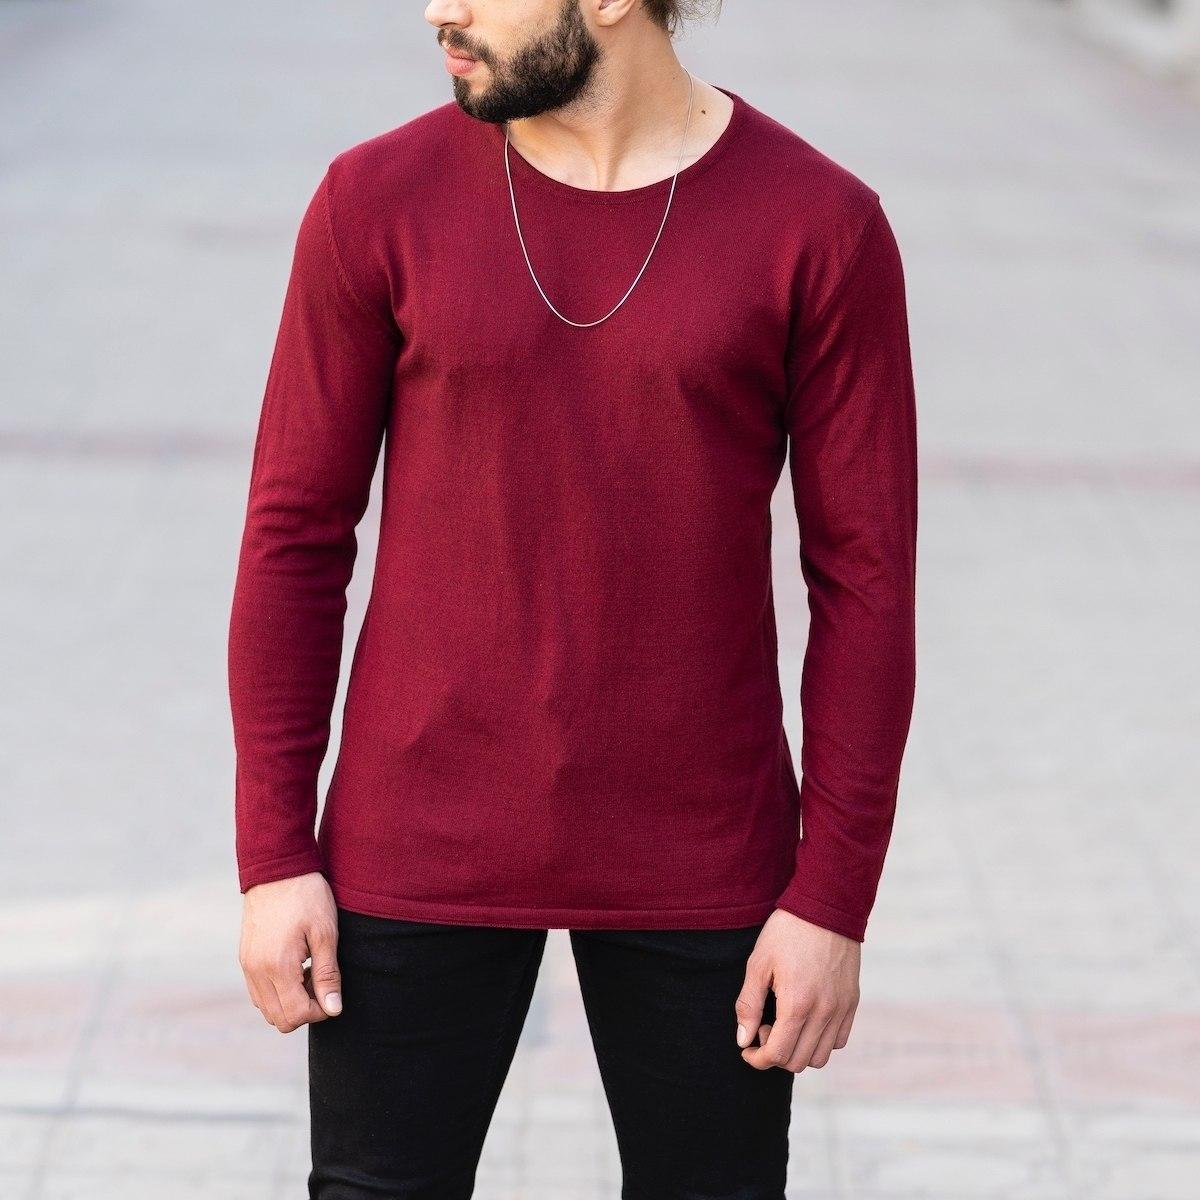 Slim-Fitting Classic Round-Neck Sweater in Claret Red Mv Premium Brand - 1